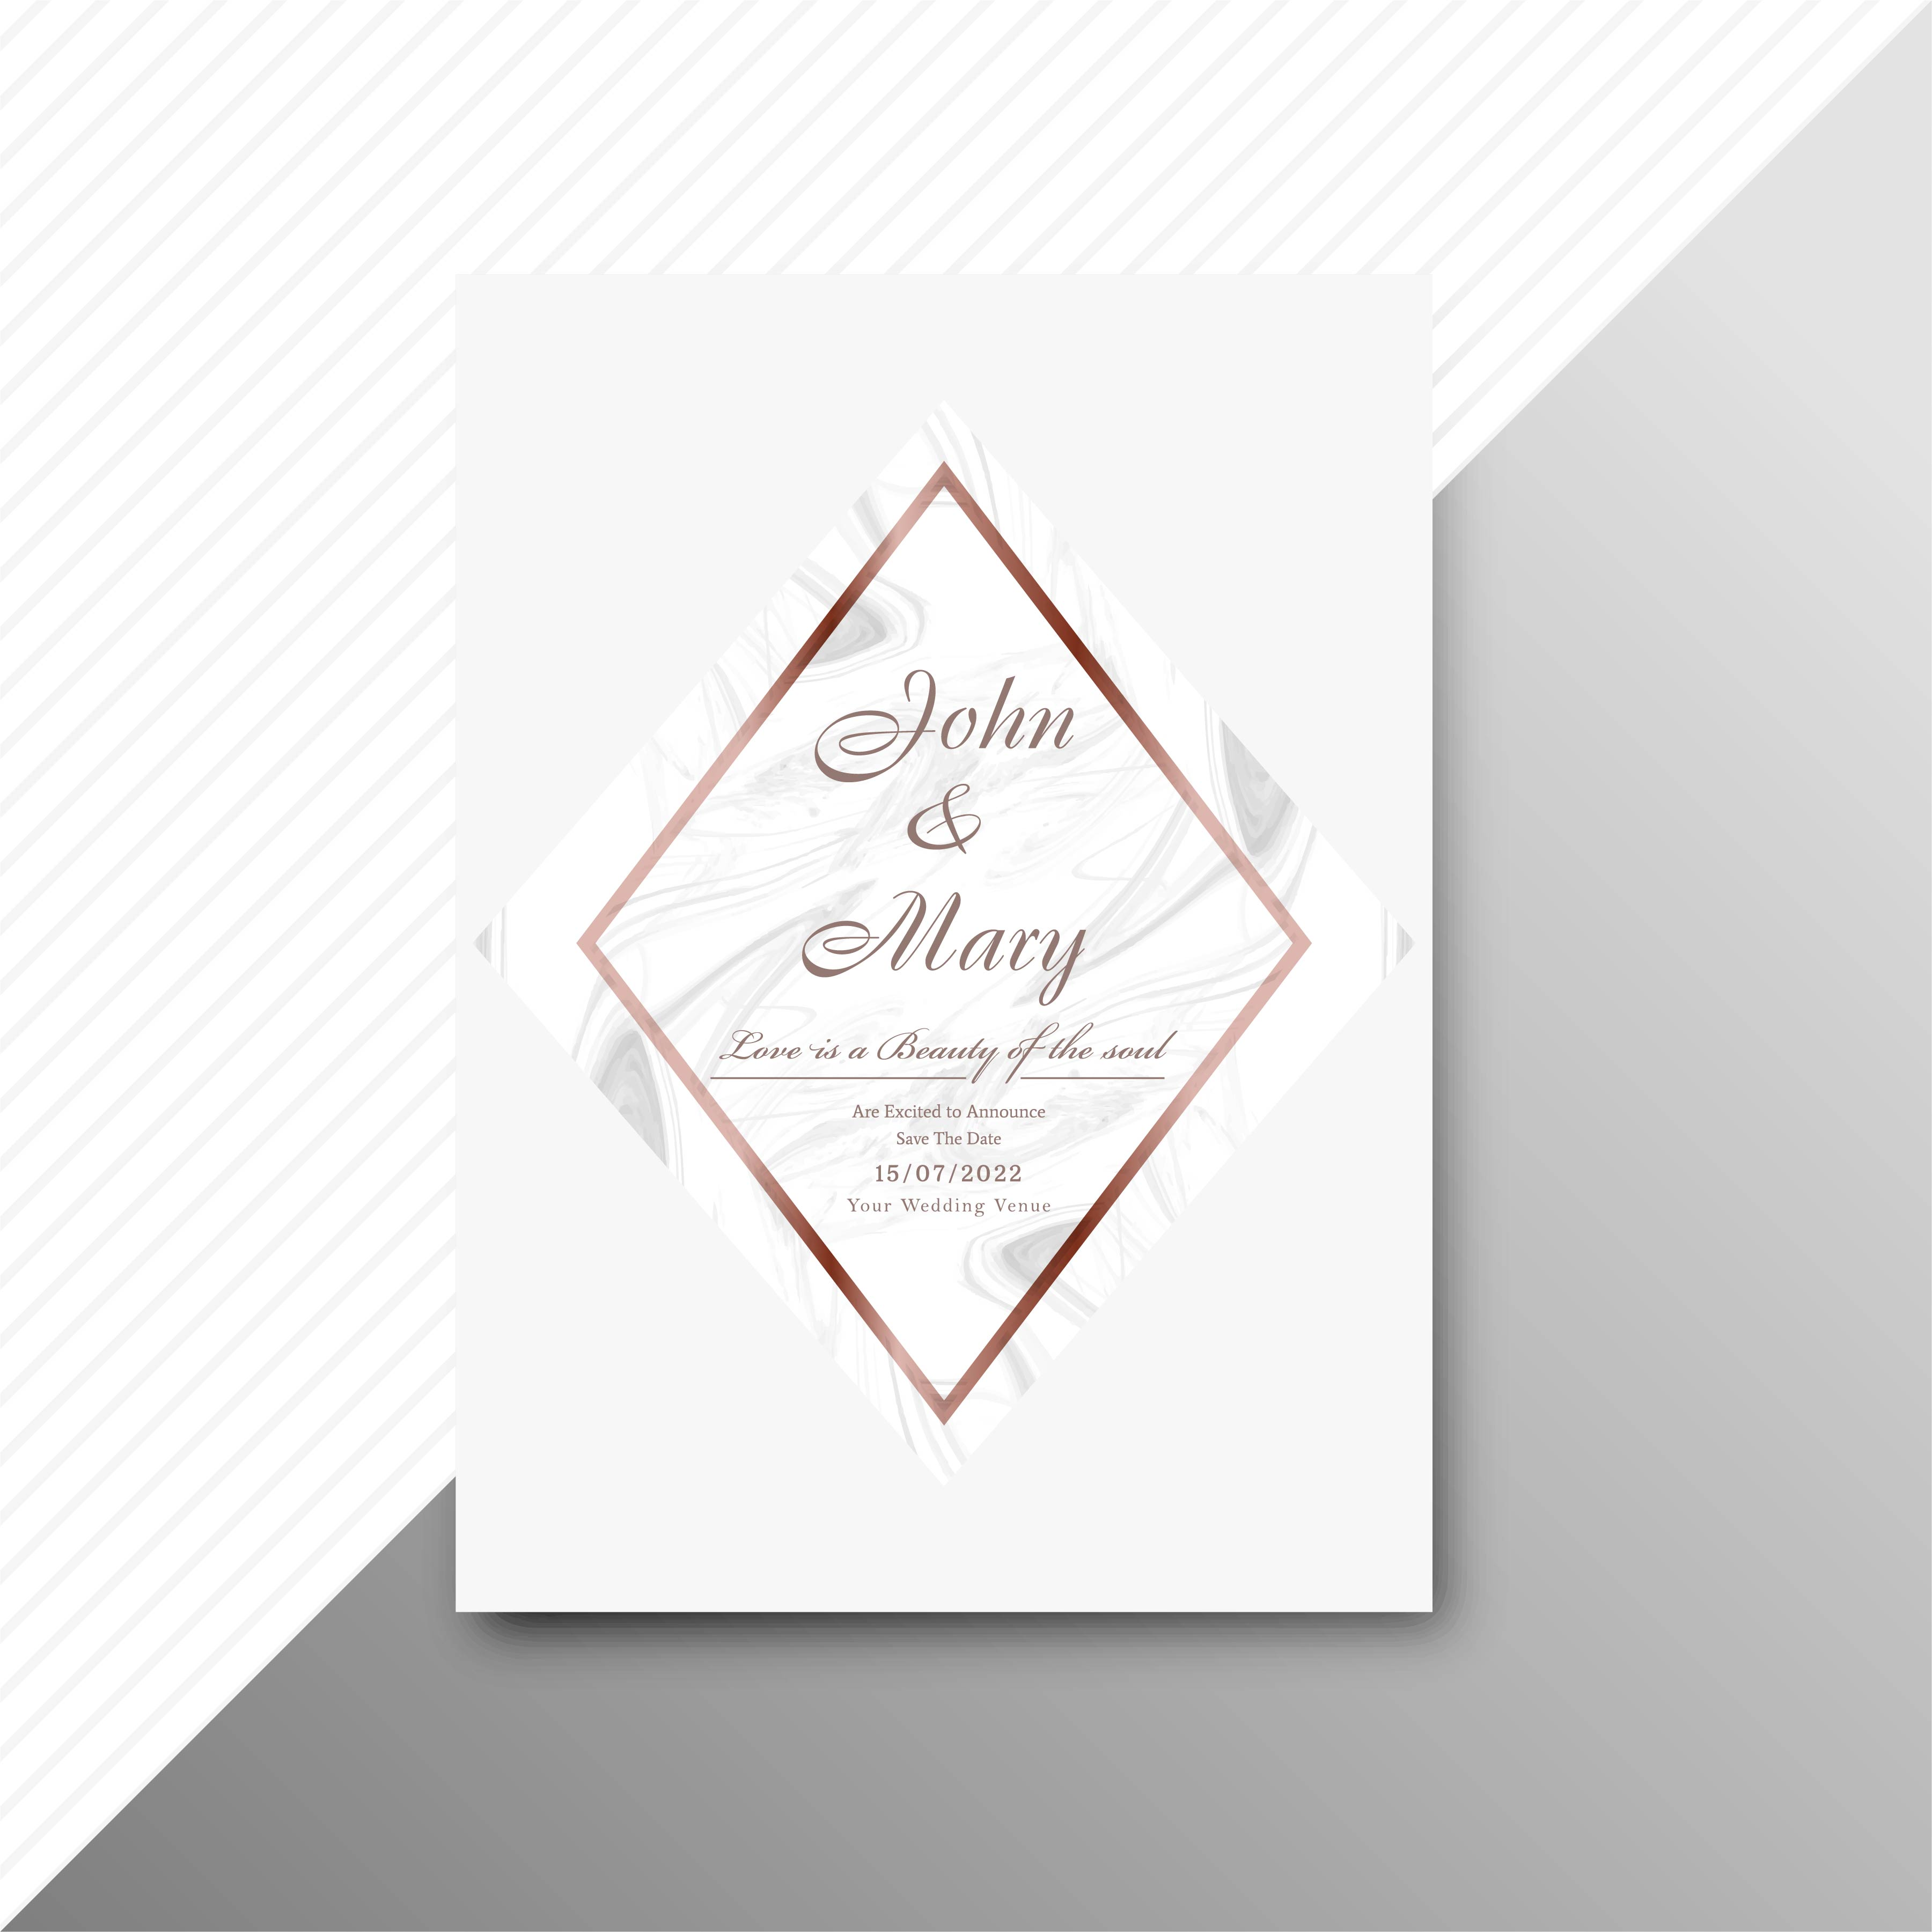 Modern wedding invitation card background - Download Free Vector Art ...